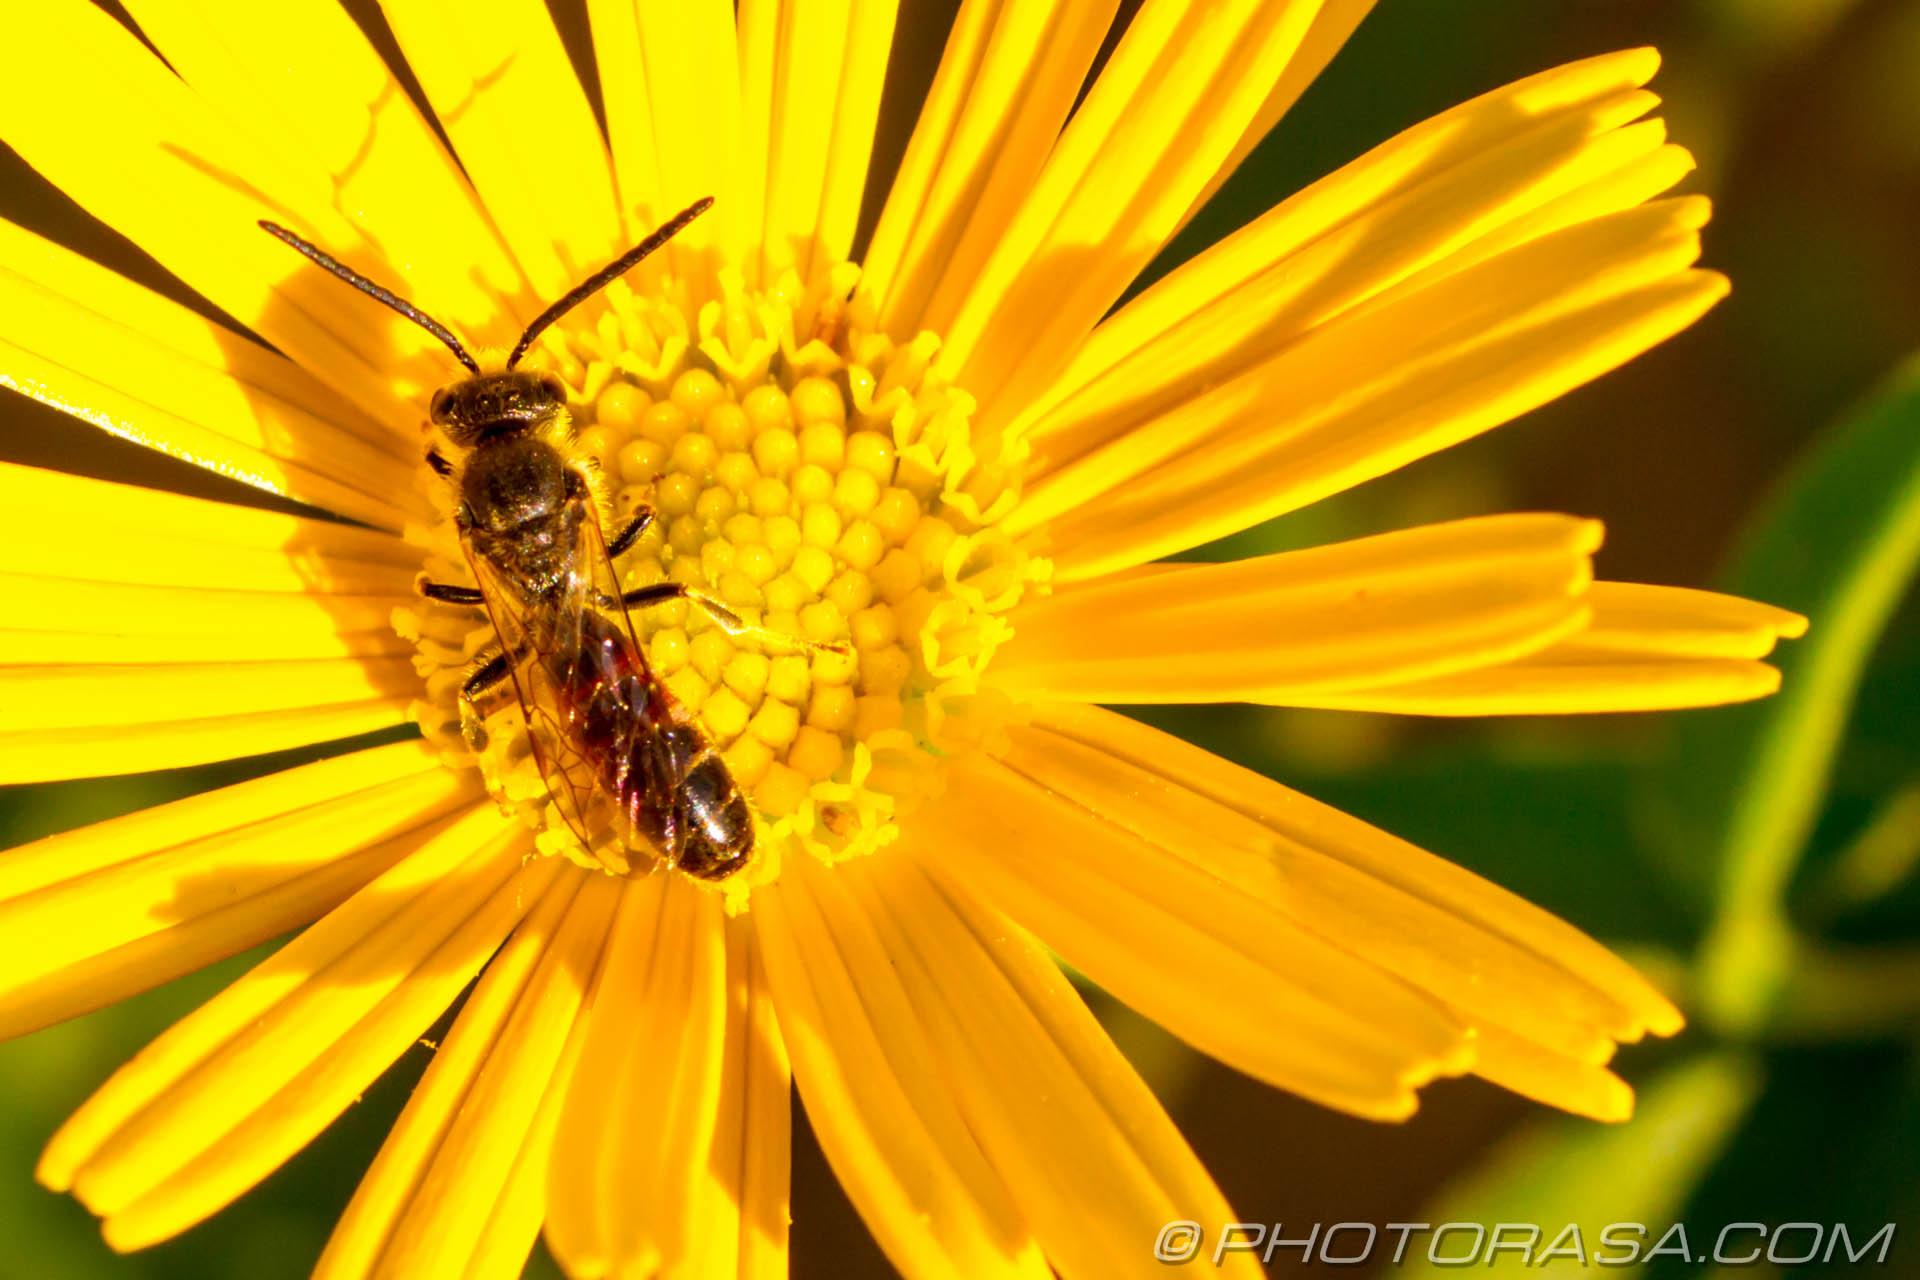 https://photorasa.com/flower-fly/casting-shadow/